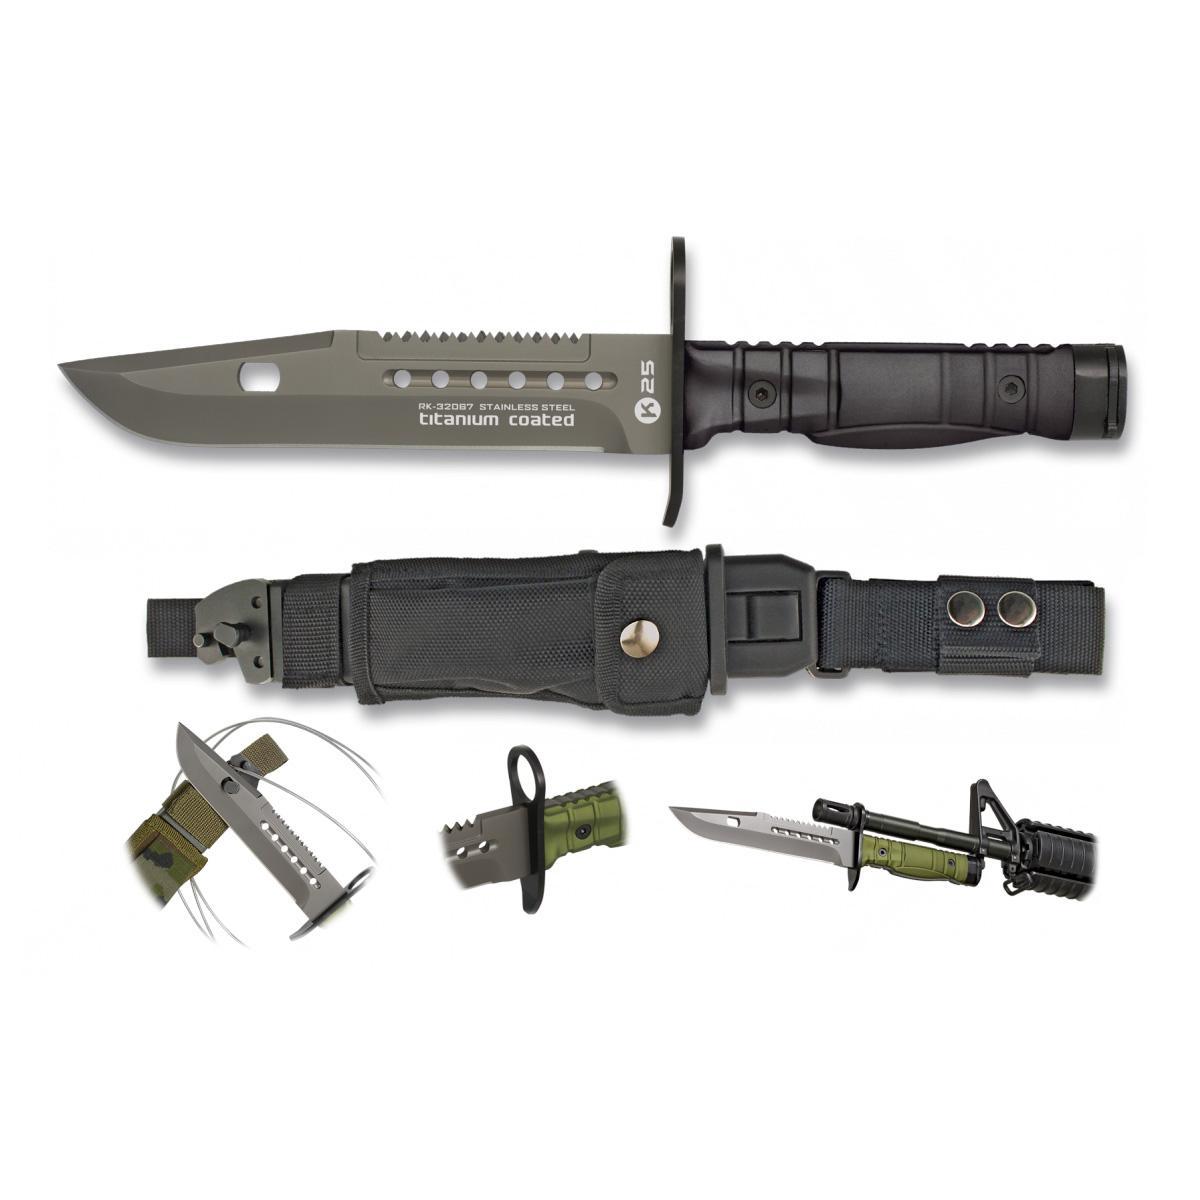 Cuchillo Bayoneta K25 Negro